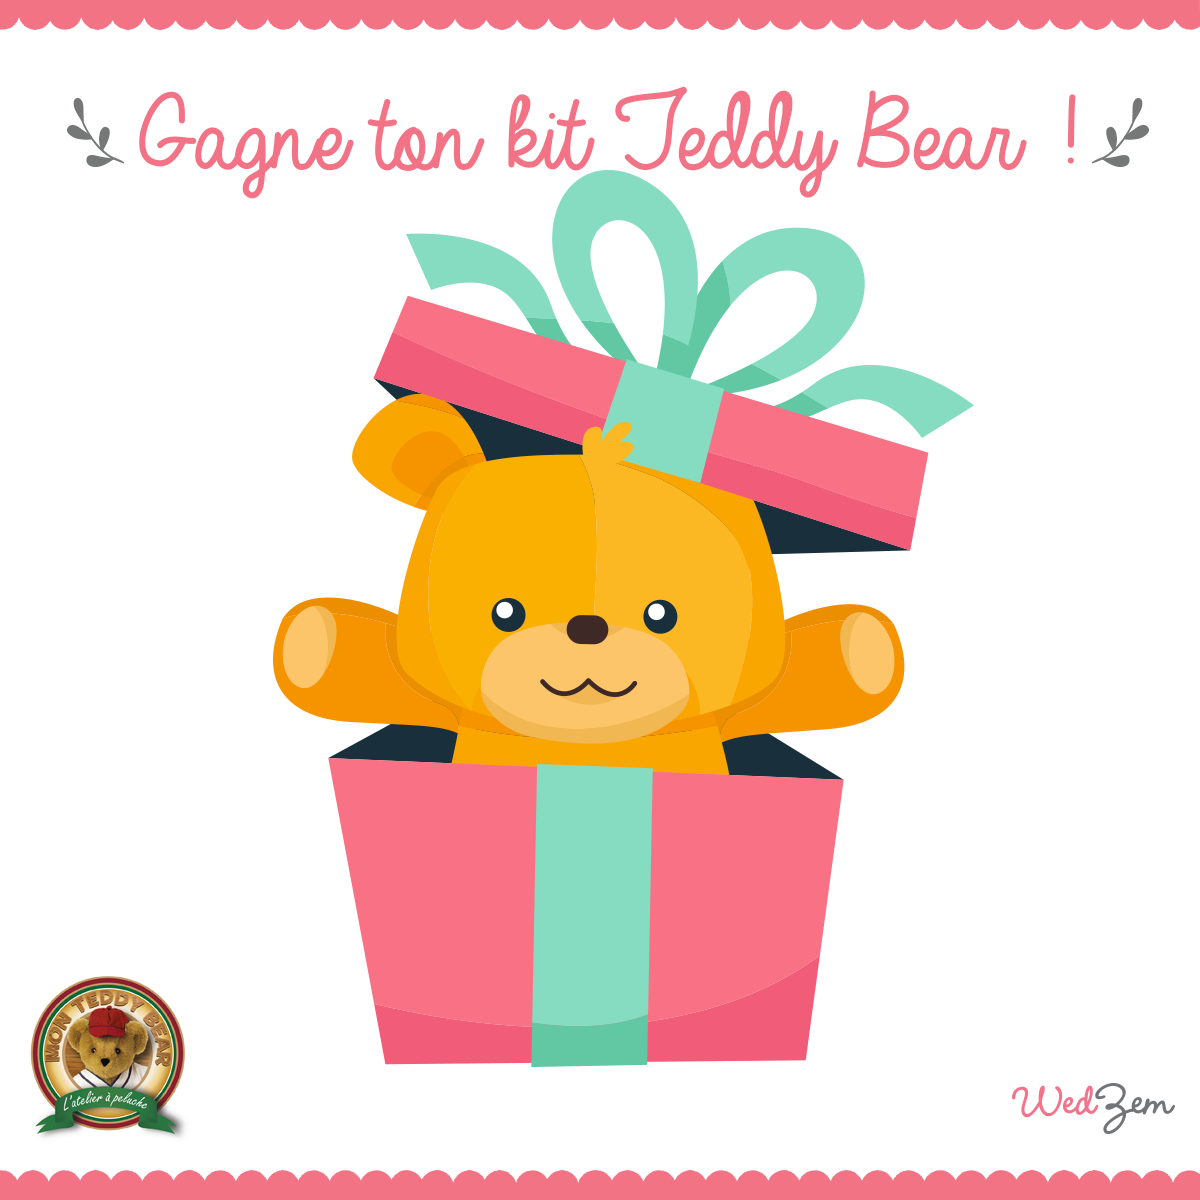 Concours Mon Teddy Bear